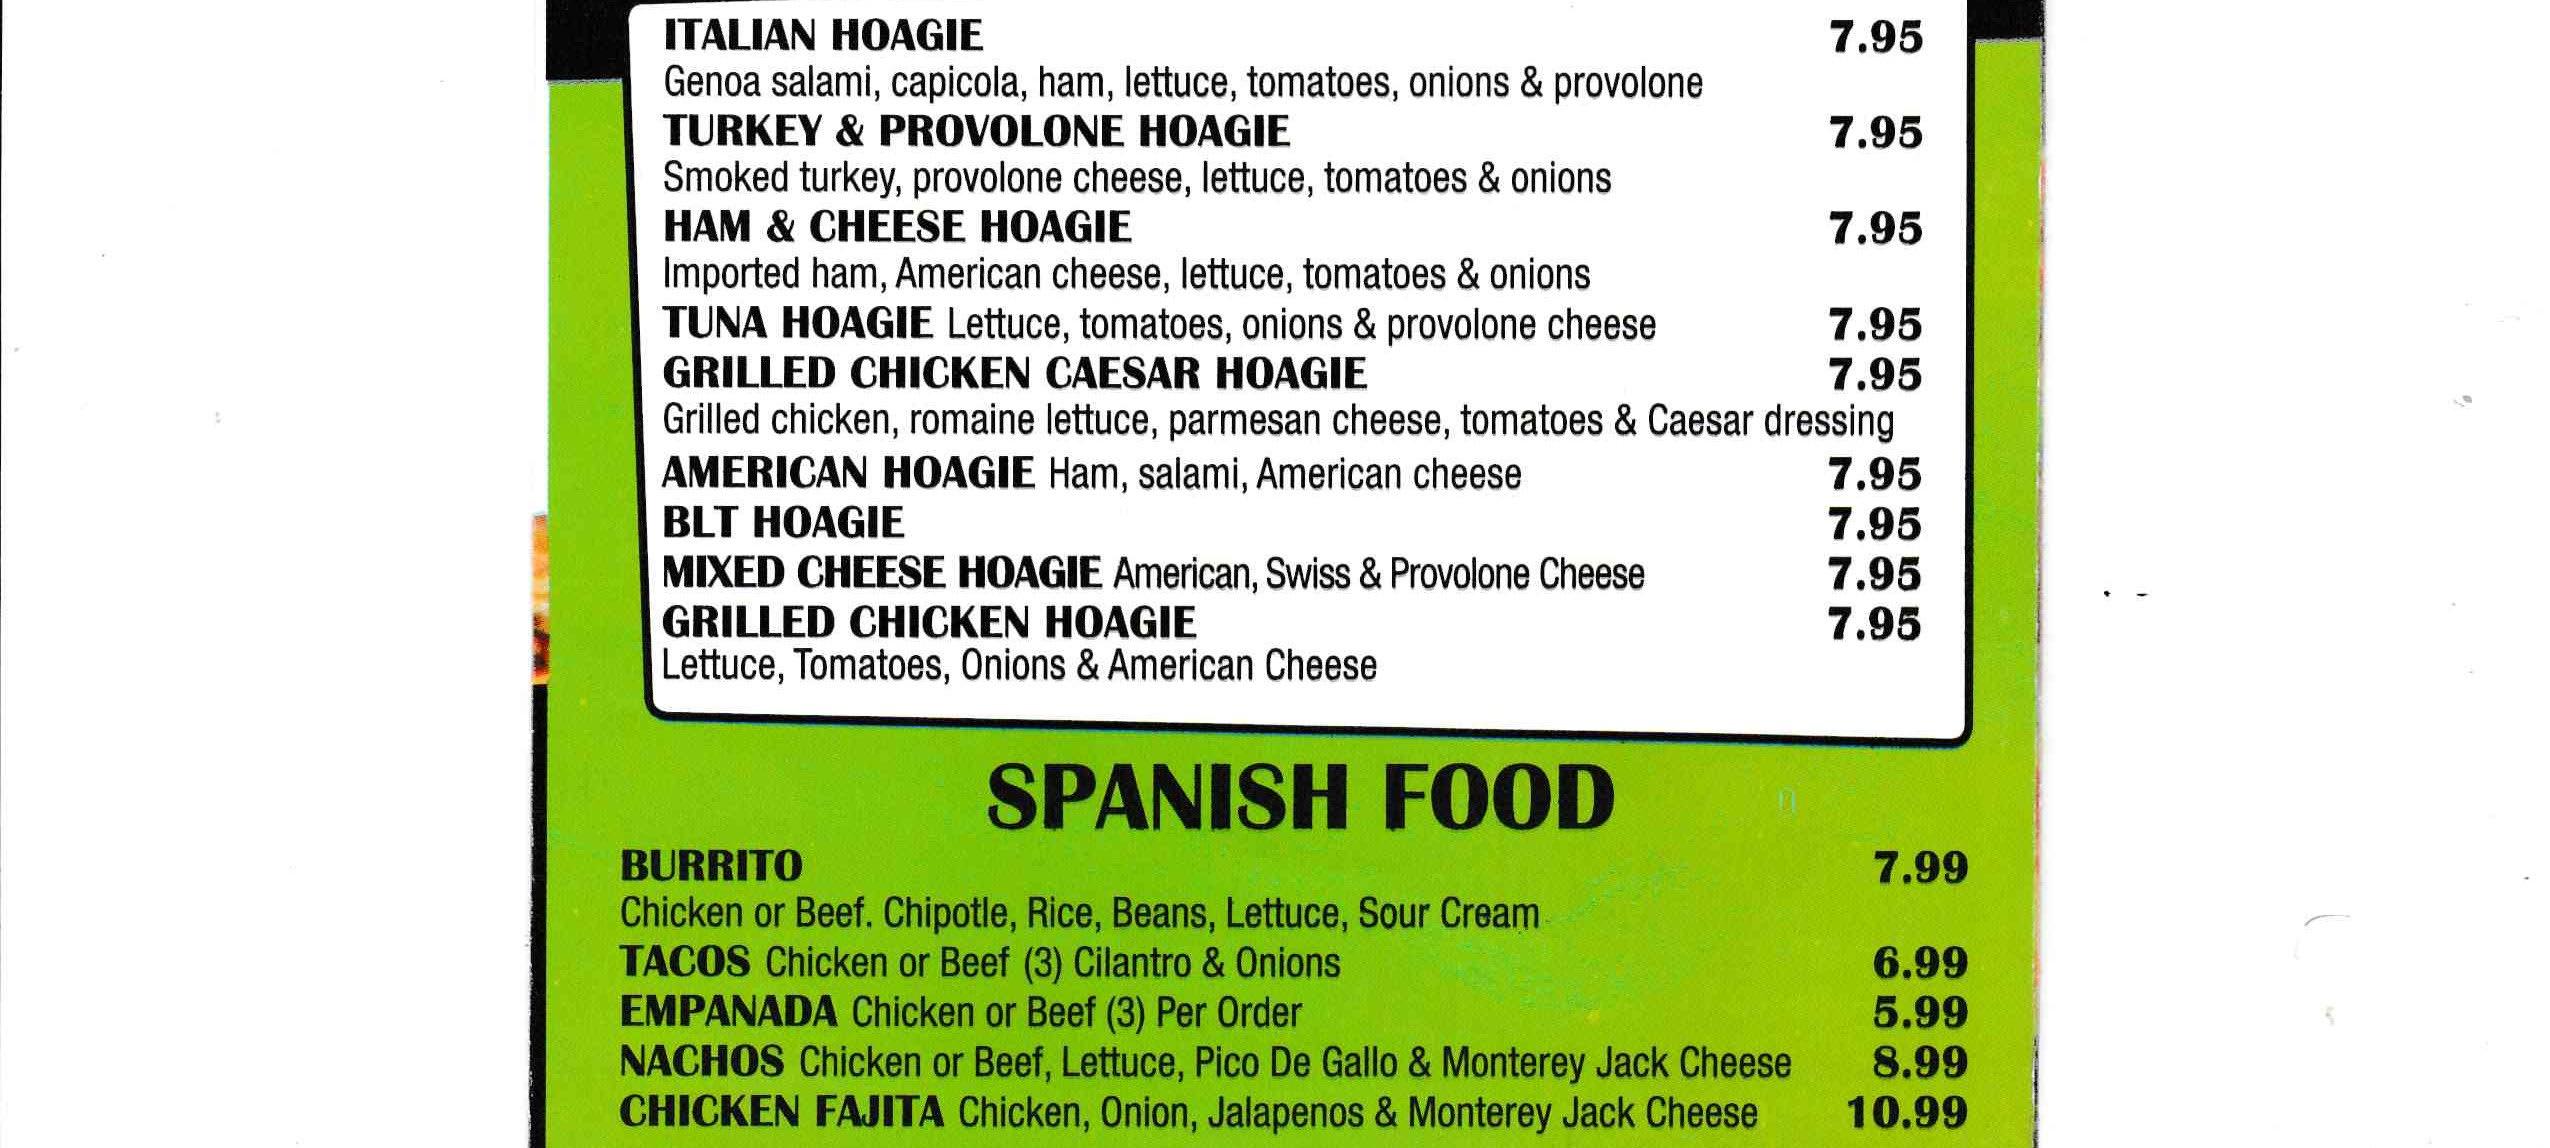 Hoagies - Spanish Food ~